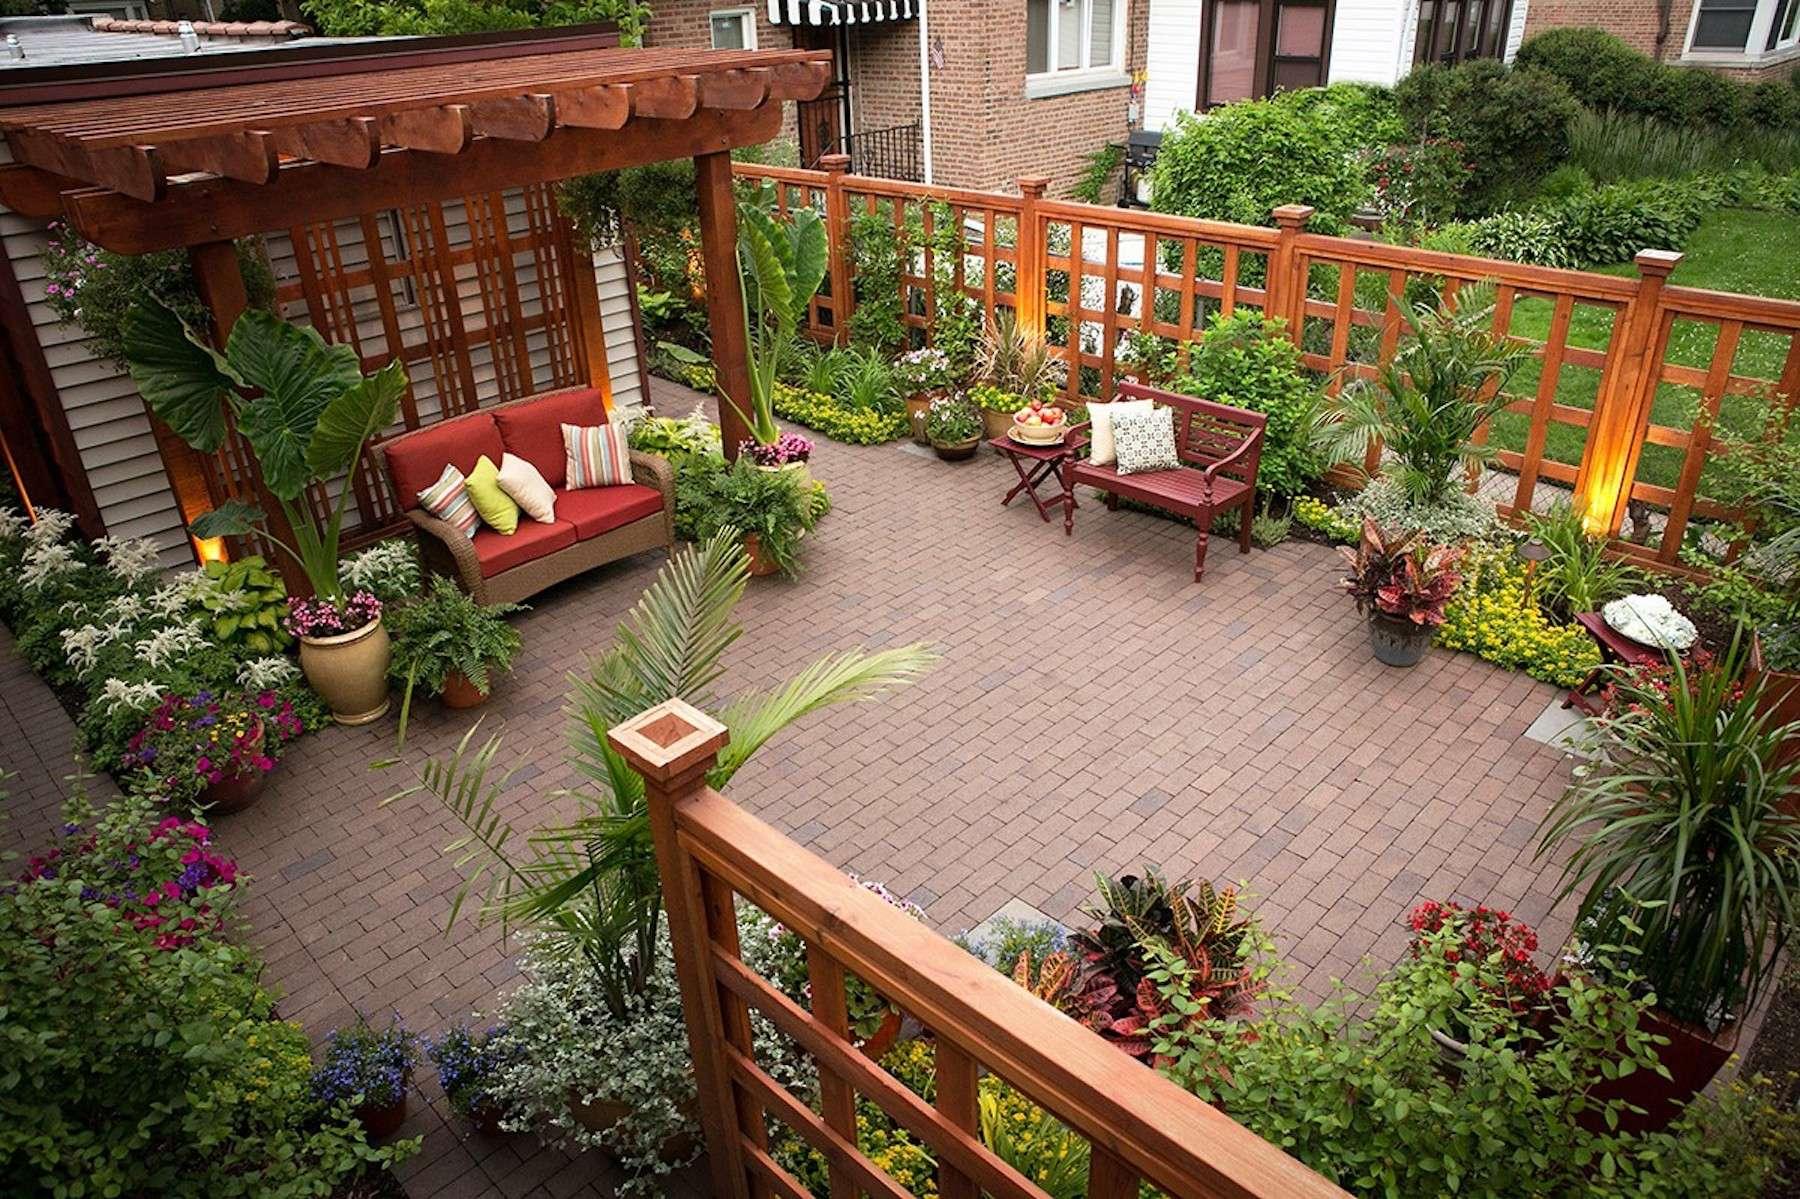 Landscaping 101: Brick Patios